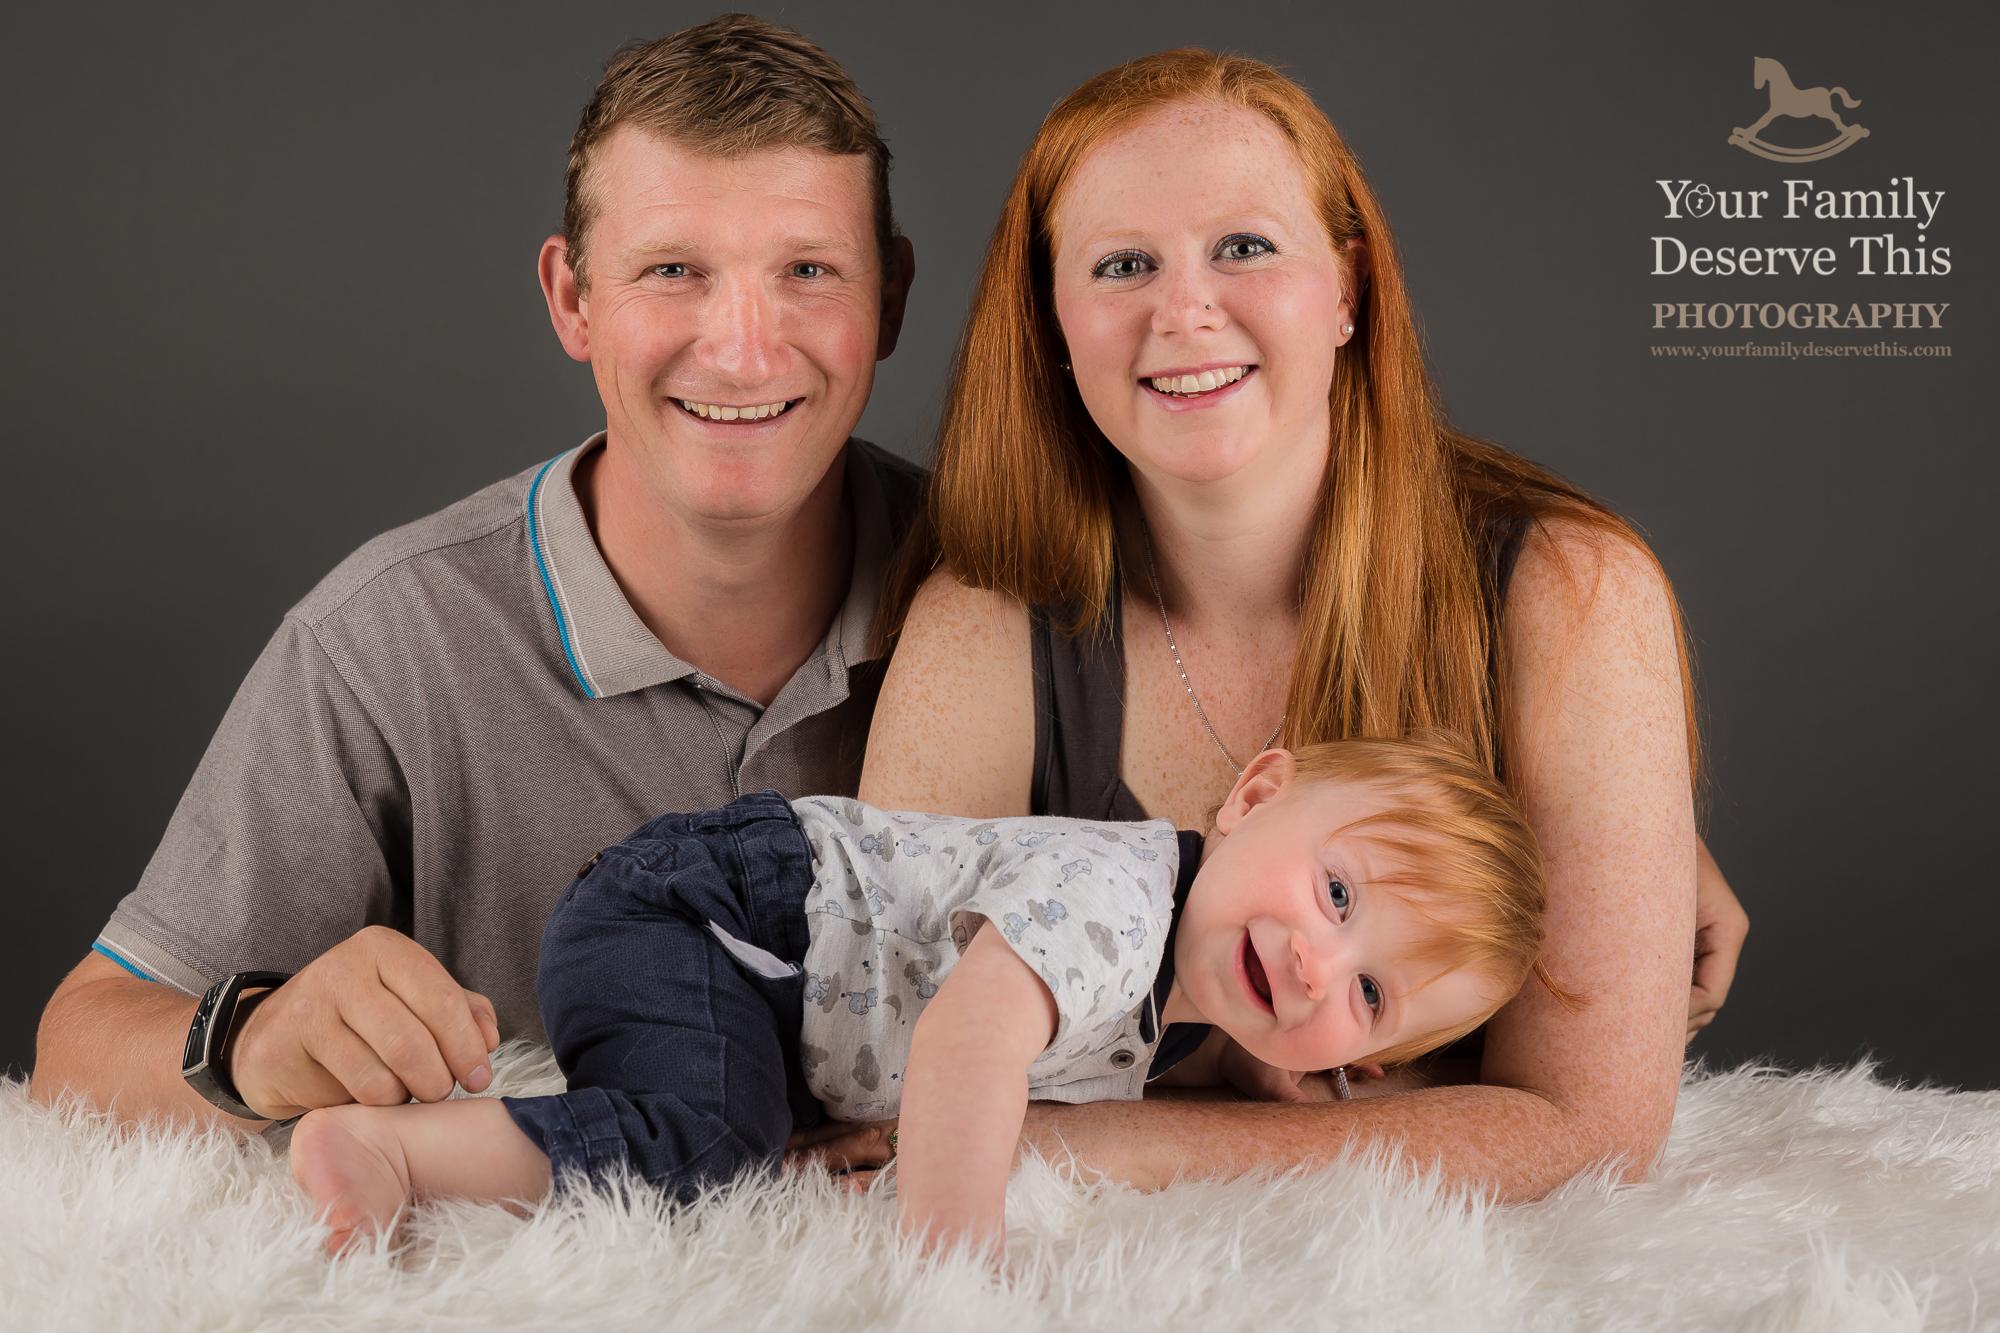 Gorgeous family Portraits to treasure with  yourfamilydeservethis.com